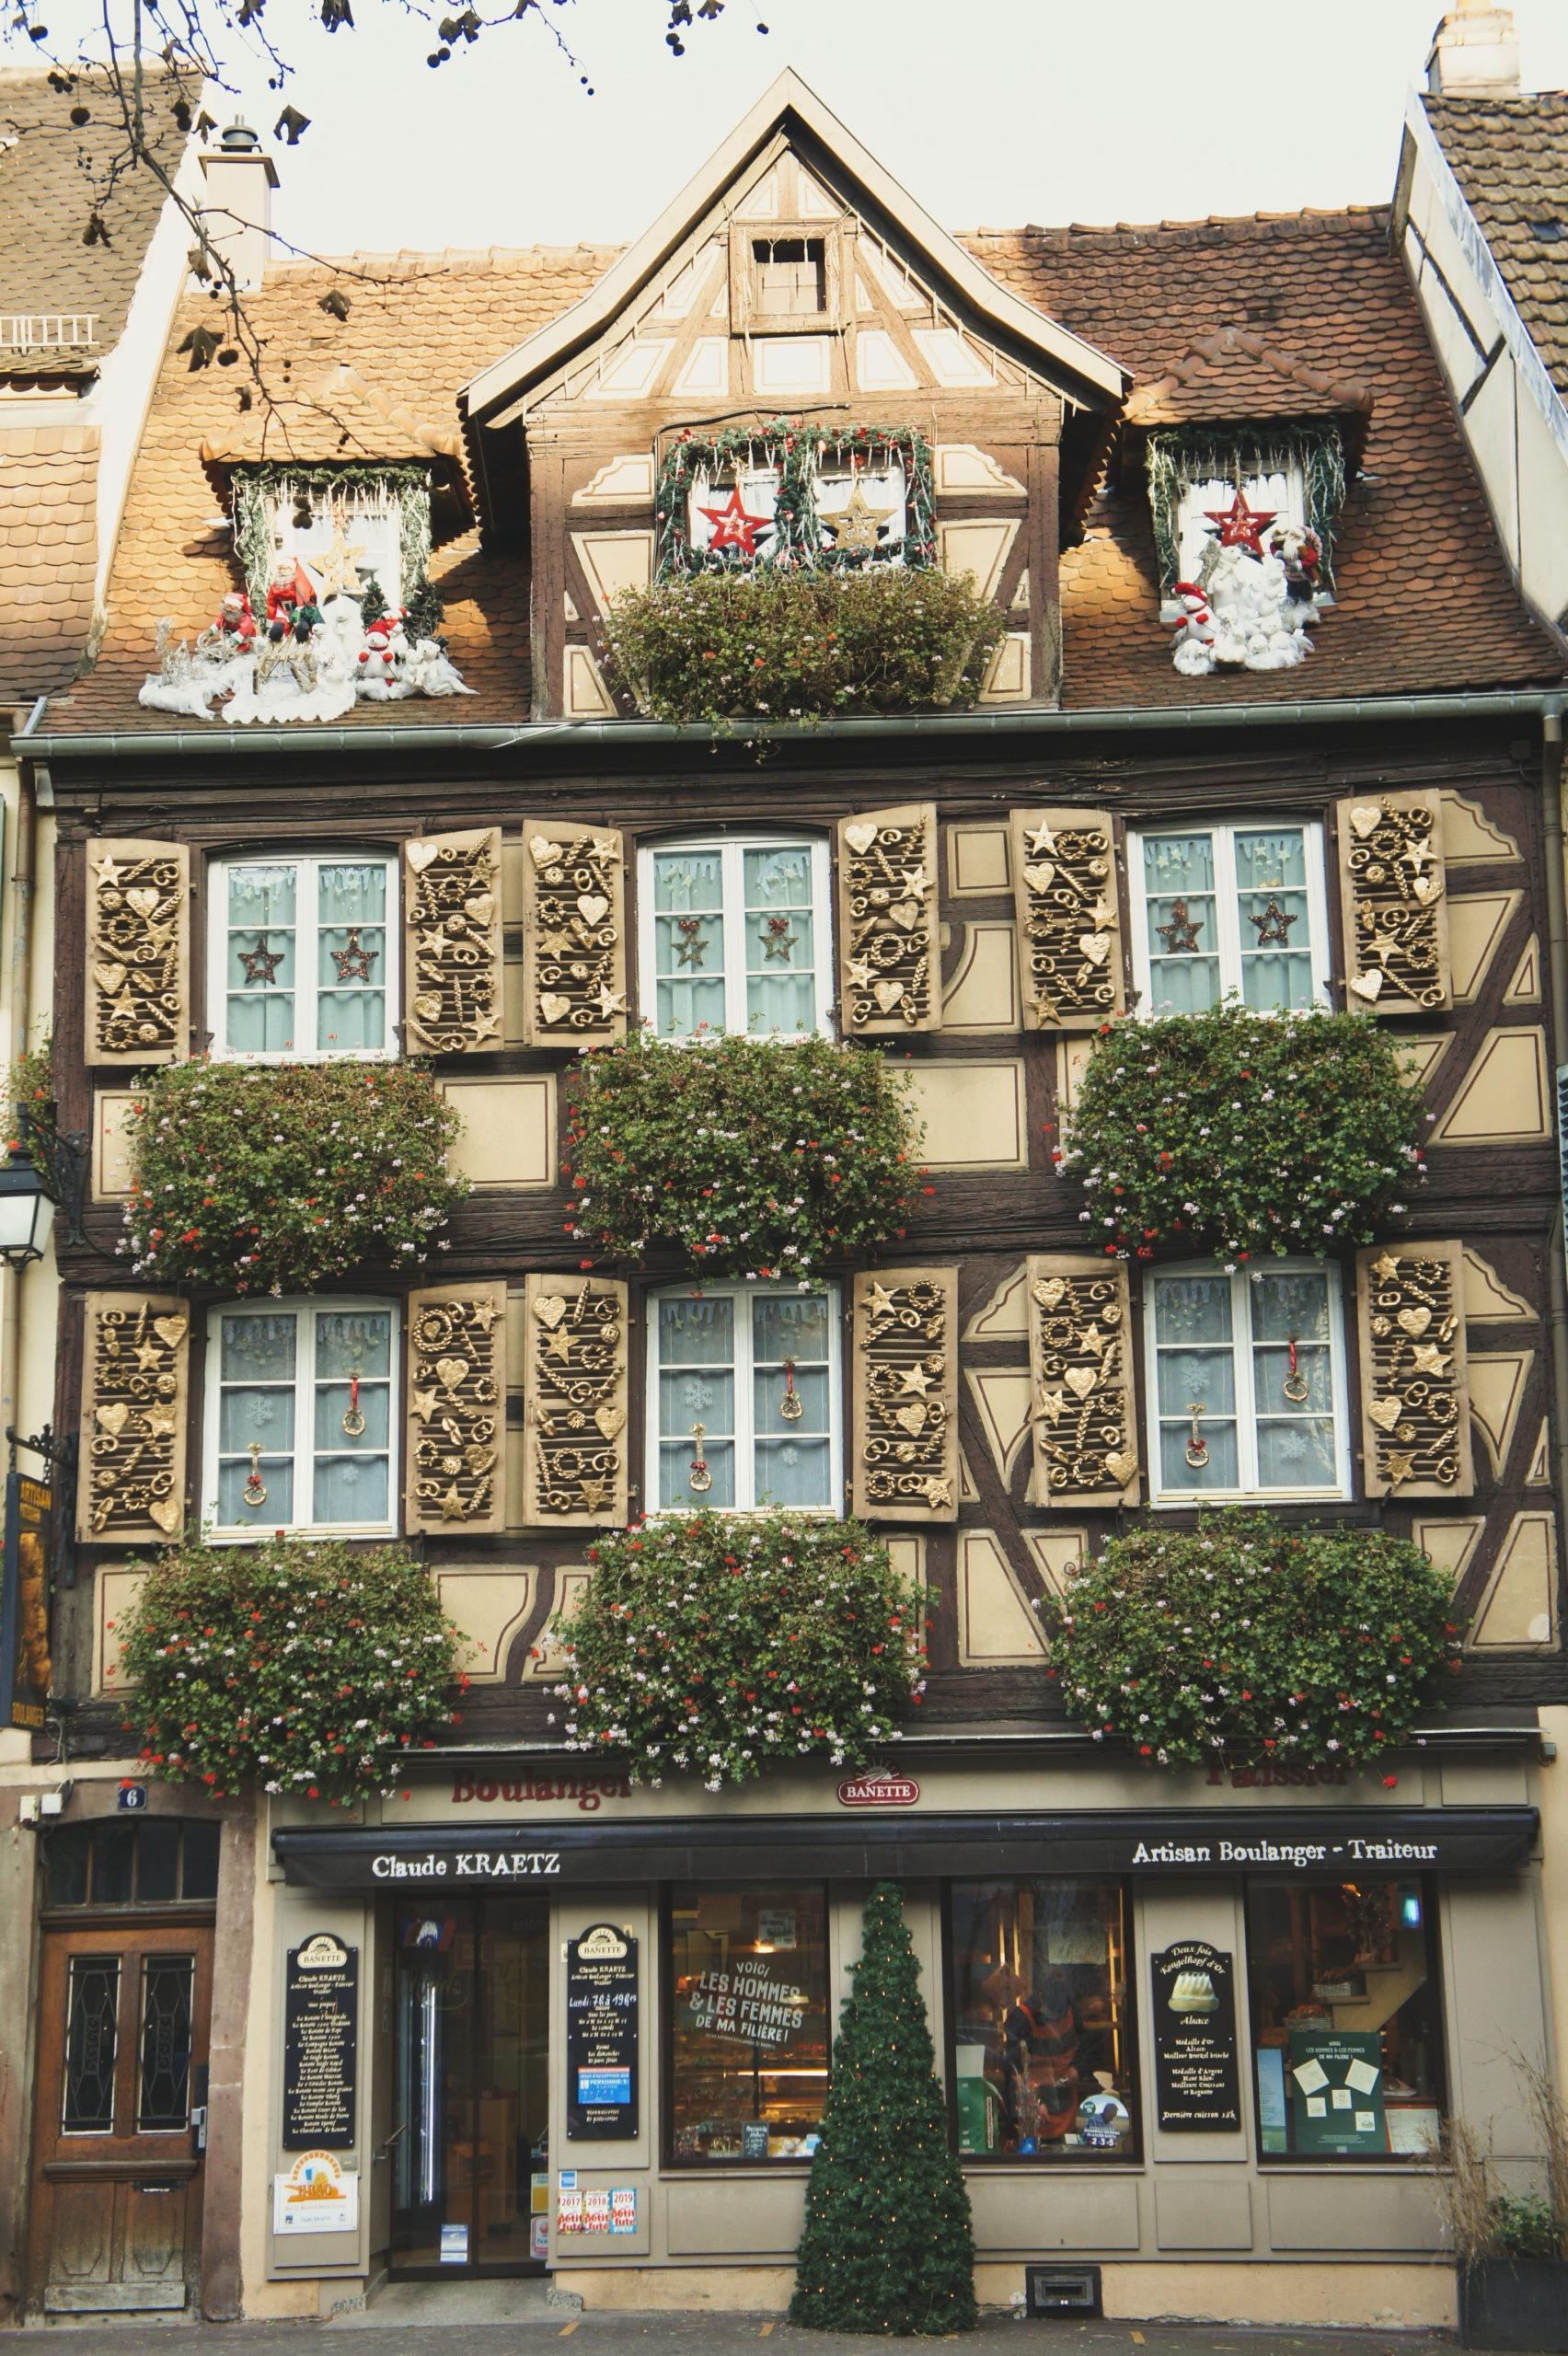 Boulangerie Kraetz à Colmar